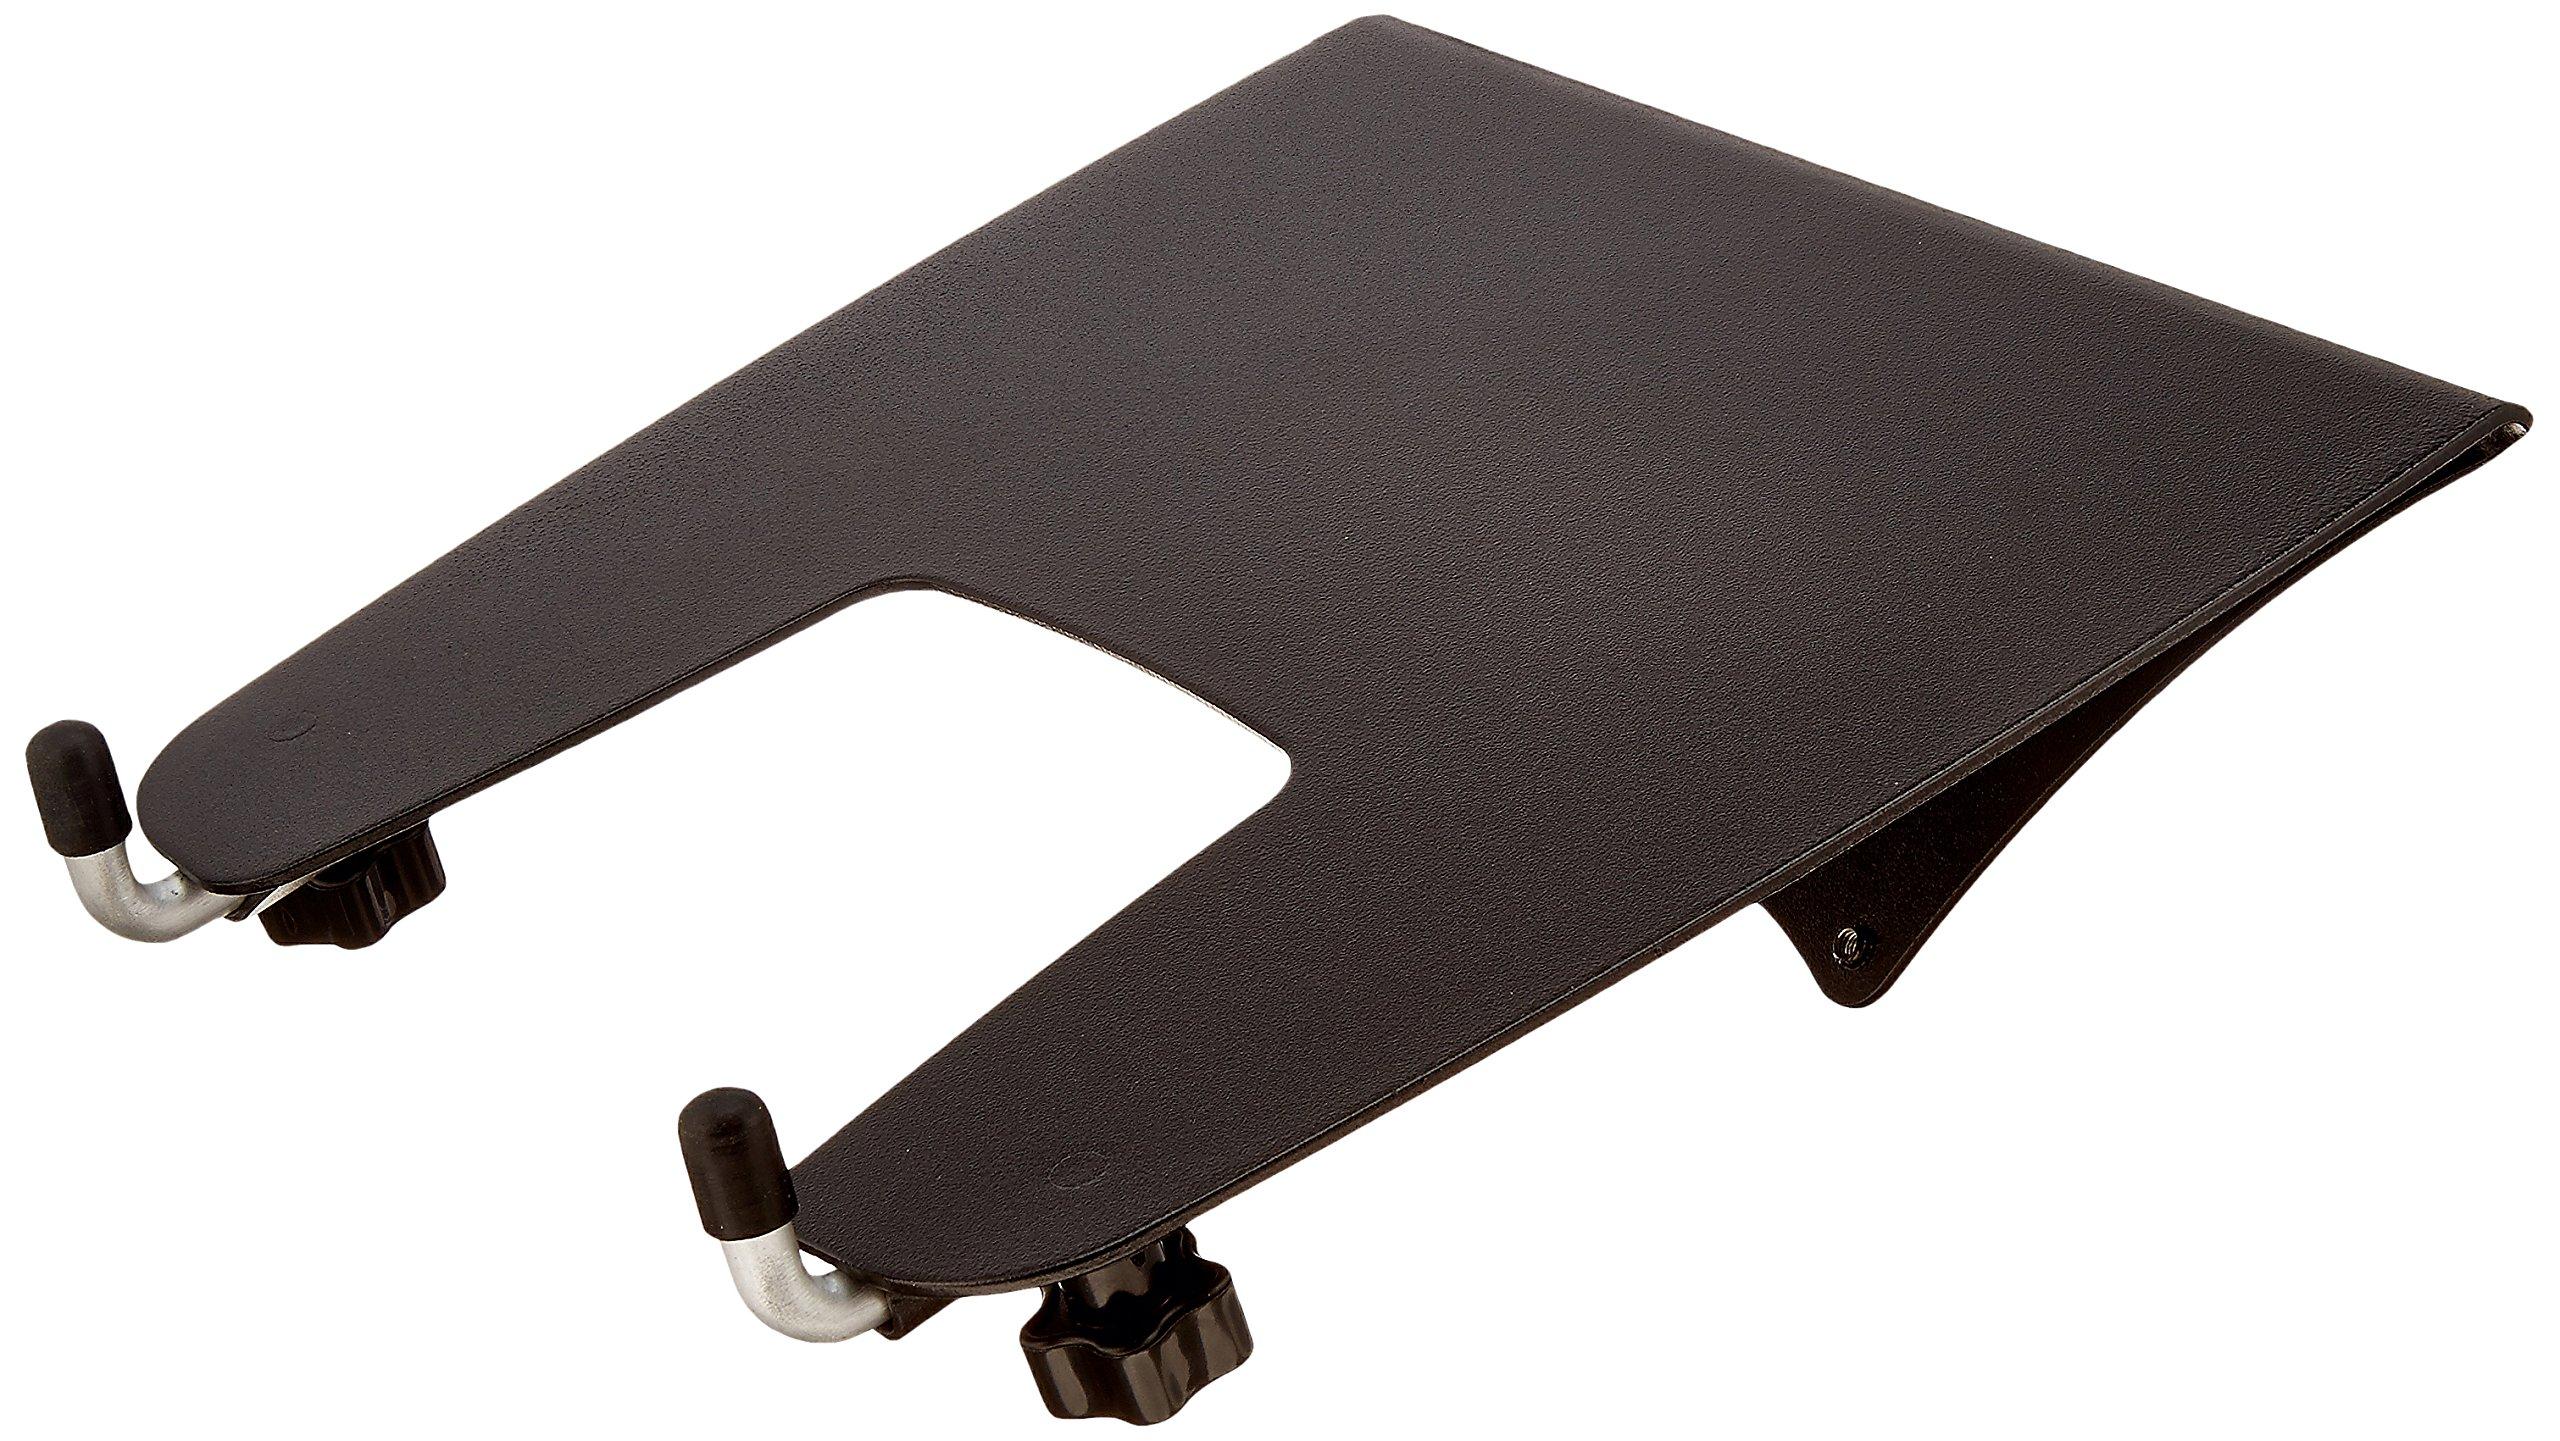 AmazonBasics Notebook Arm Mount Tray